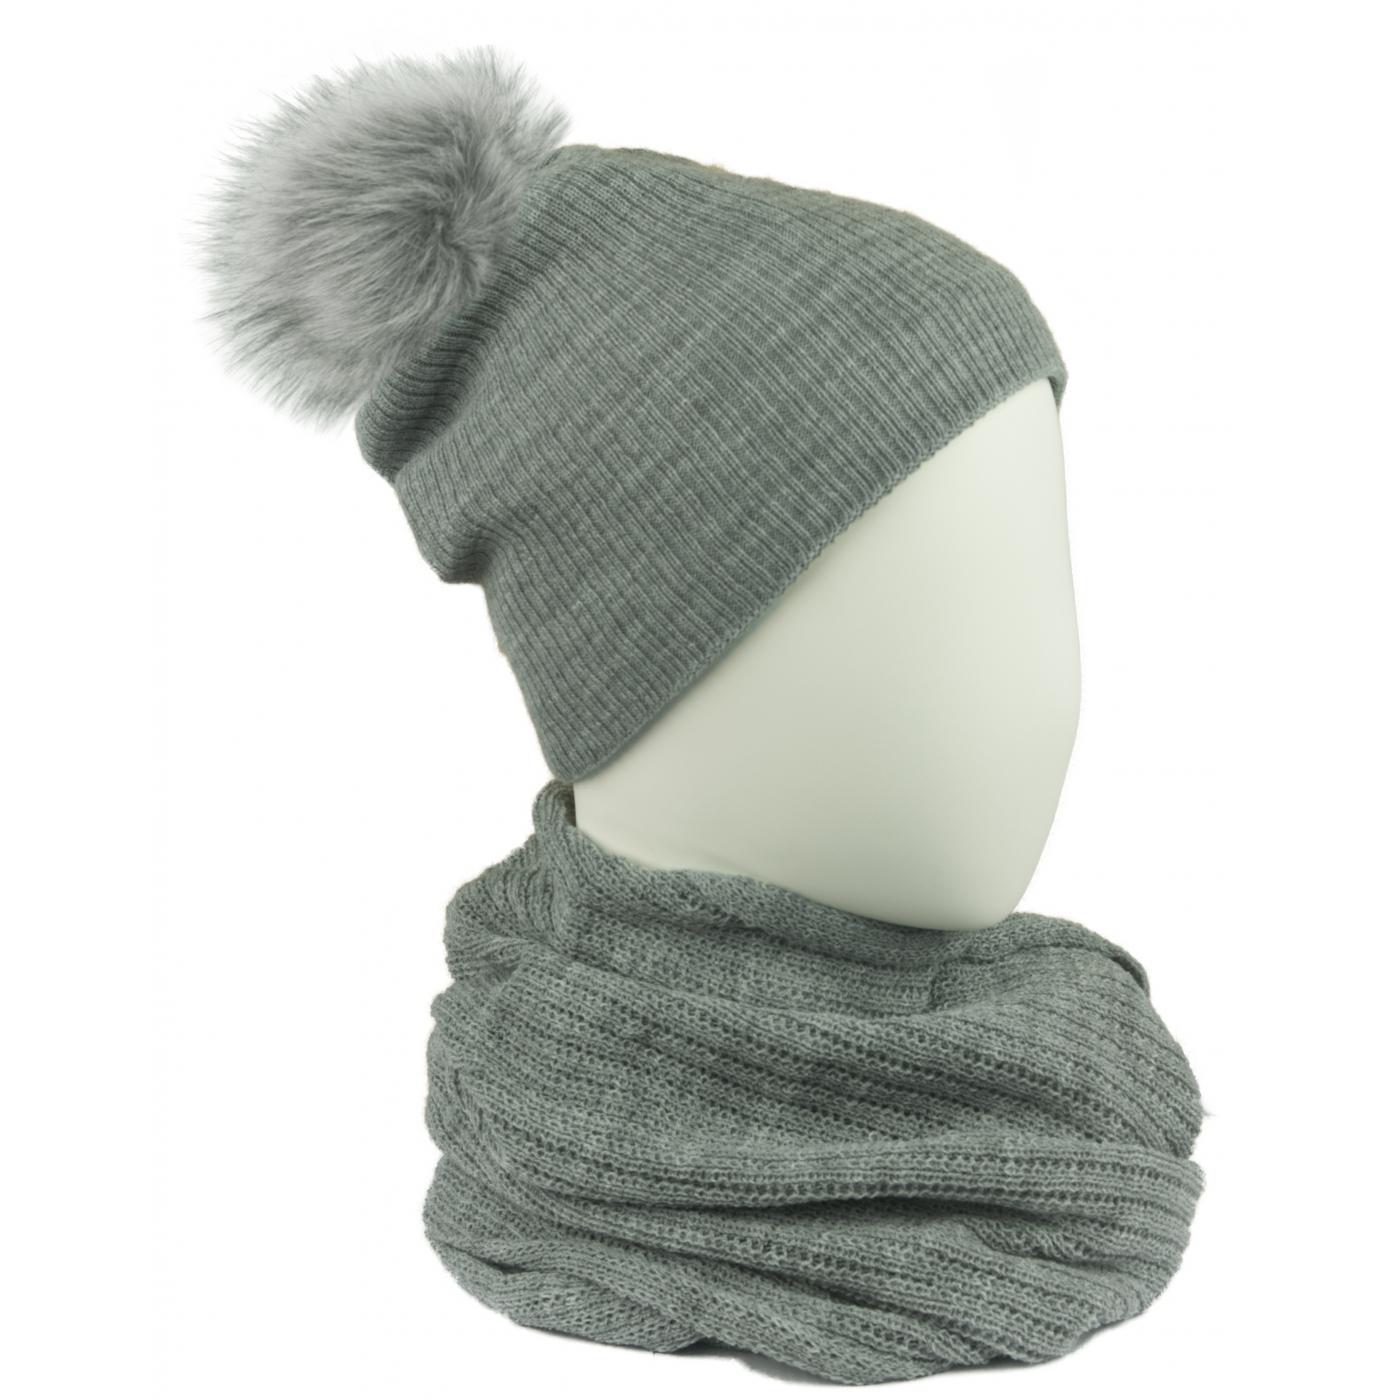 Komplet damski czapka na polarze z pomponem i komin - szary